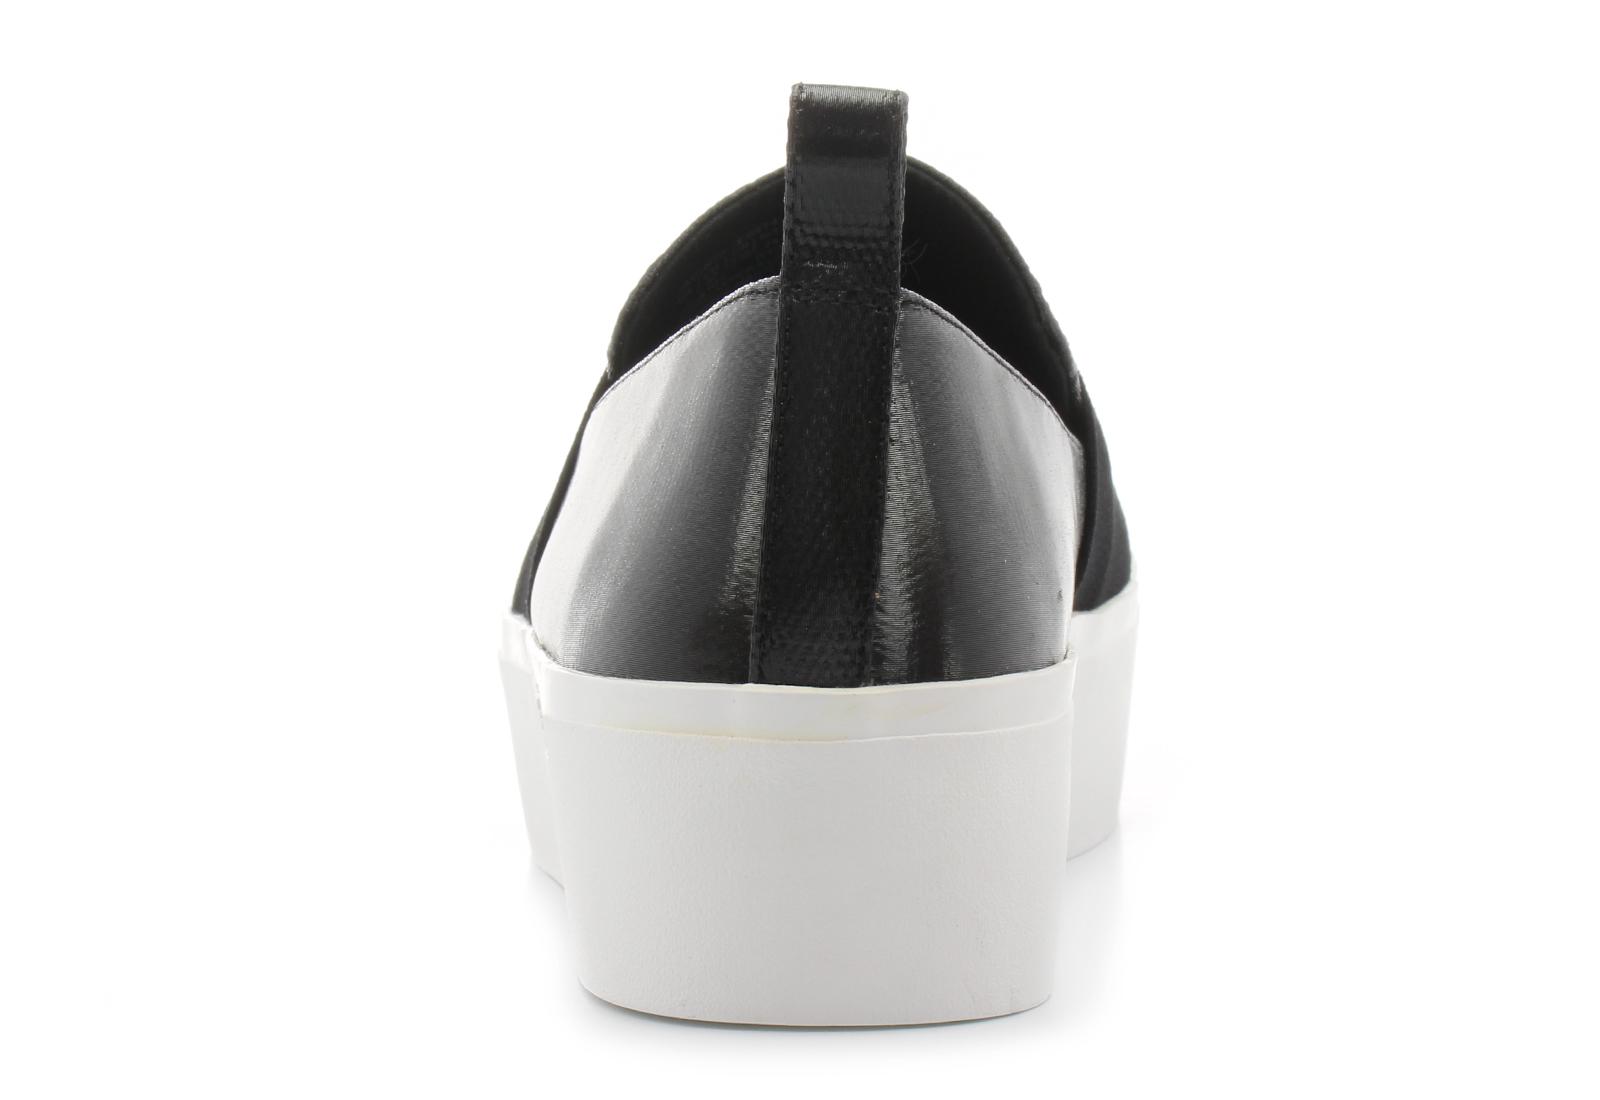 Calvin Klein Black Label Shoes Jacinta E6674 BLK Online shop for sneakers, shoes and boots